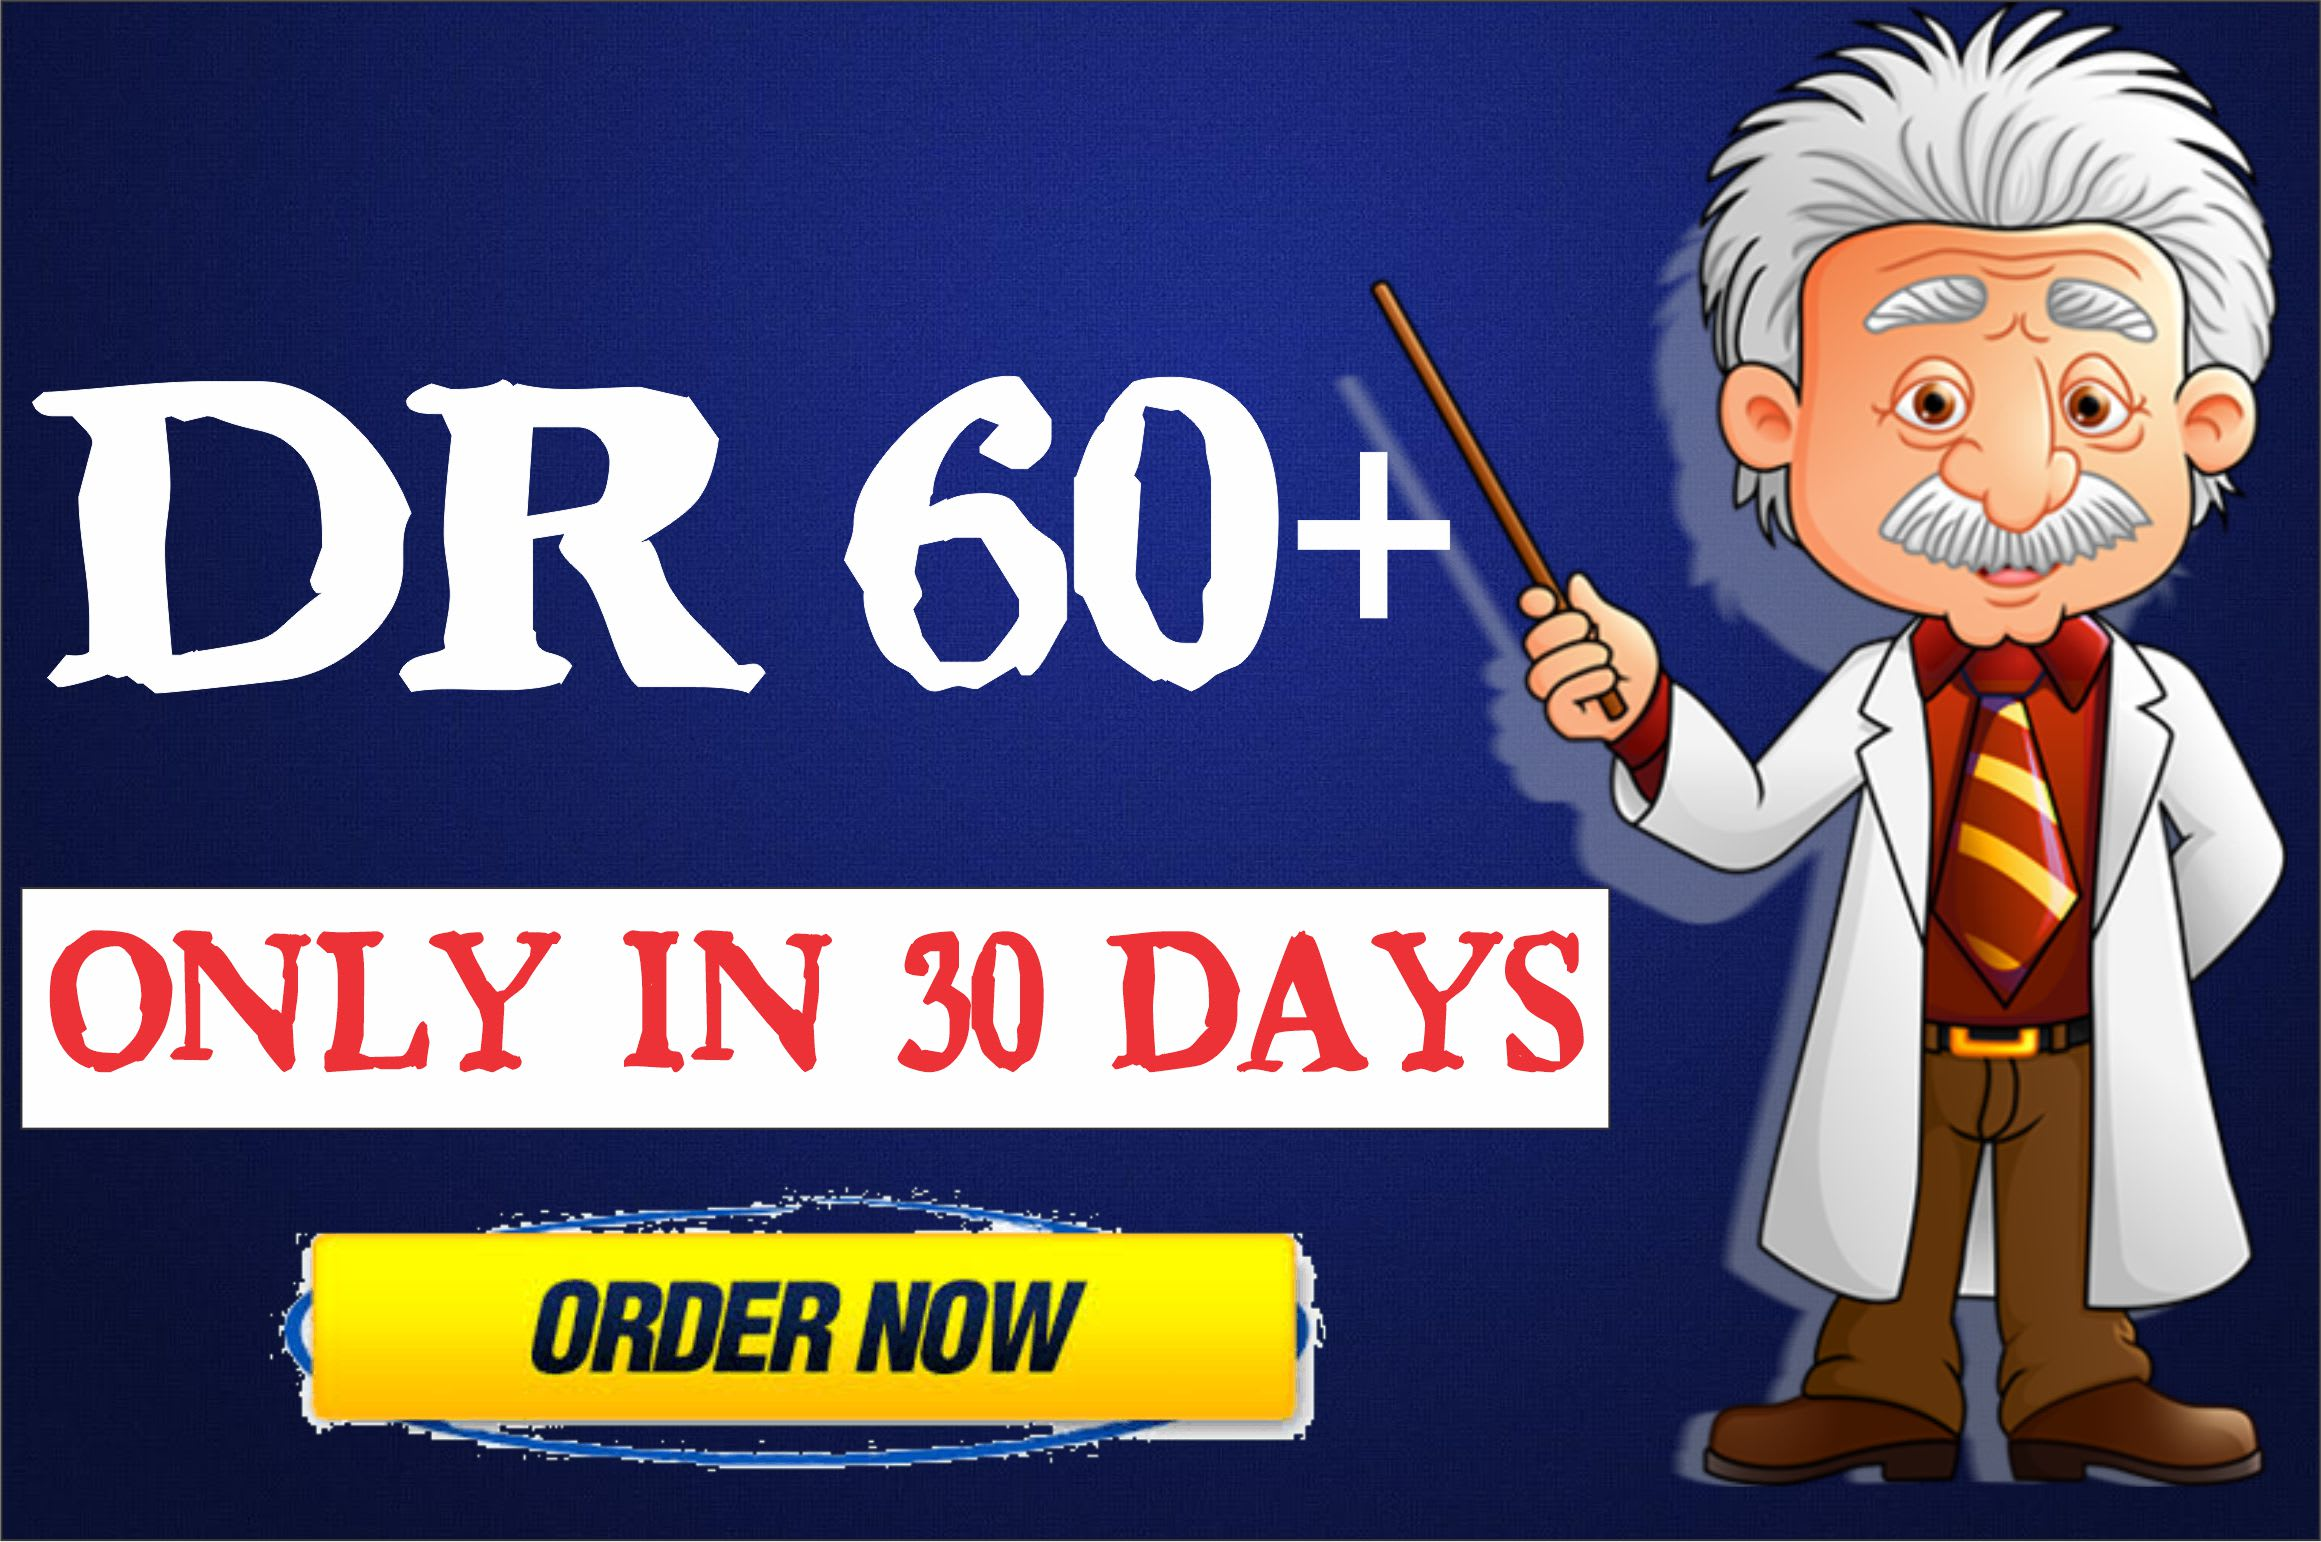 increase ahrefs domain rating DR 60+